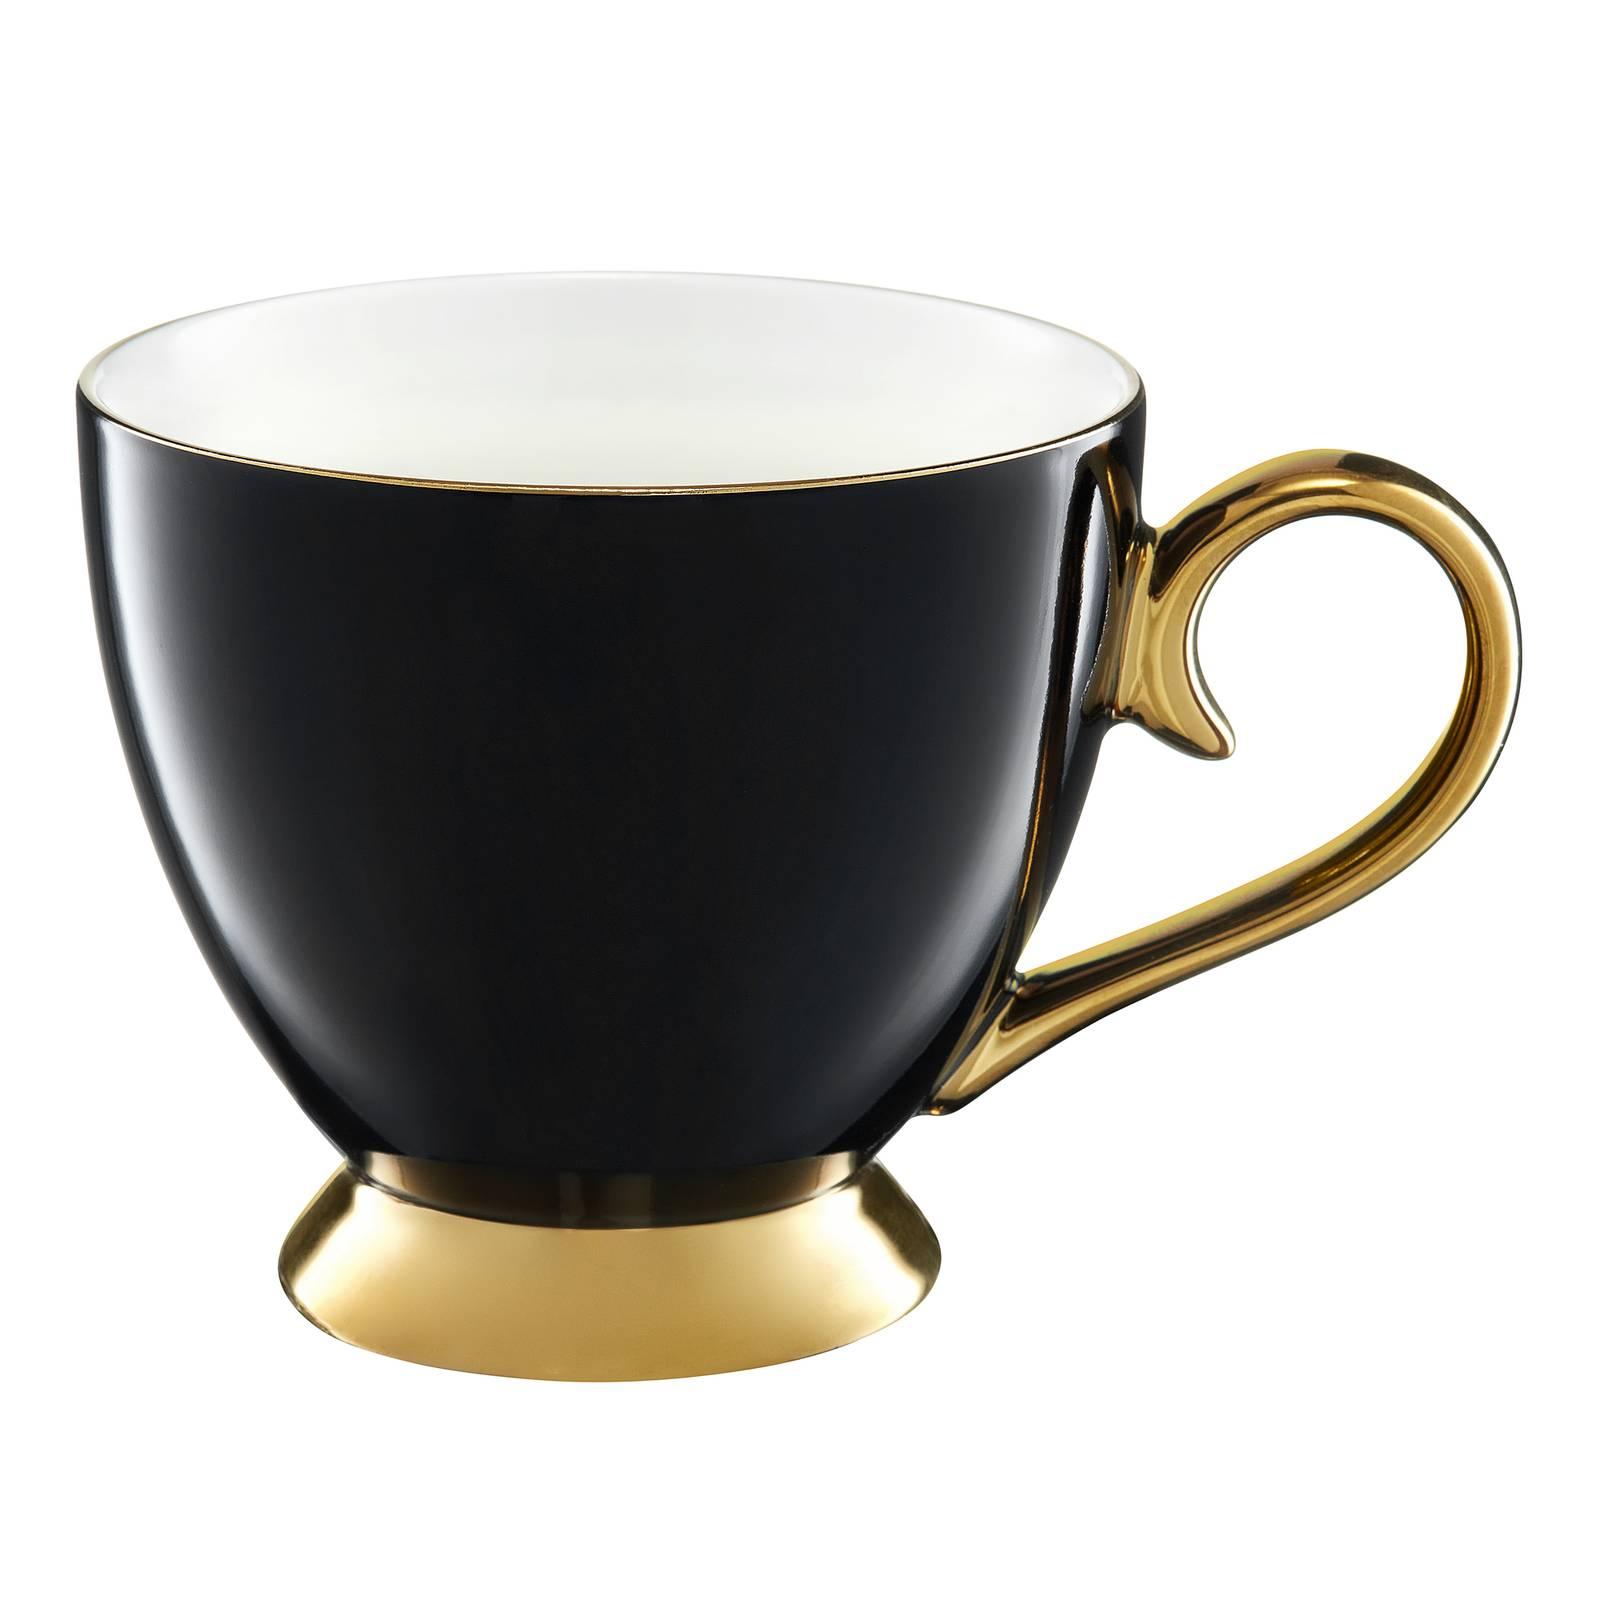 Kubek Royal 400 ml czarno-złoty AMBITION